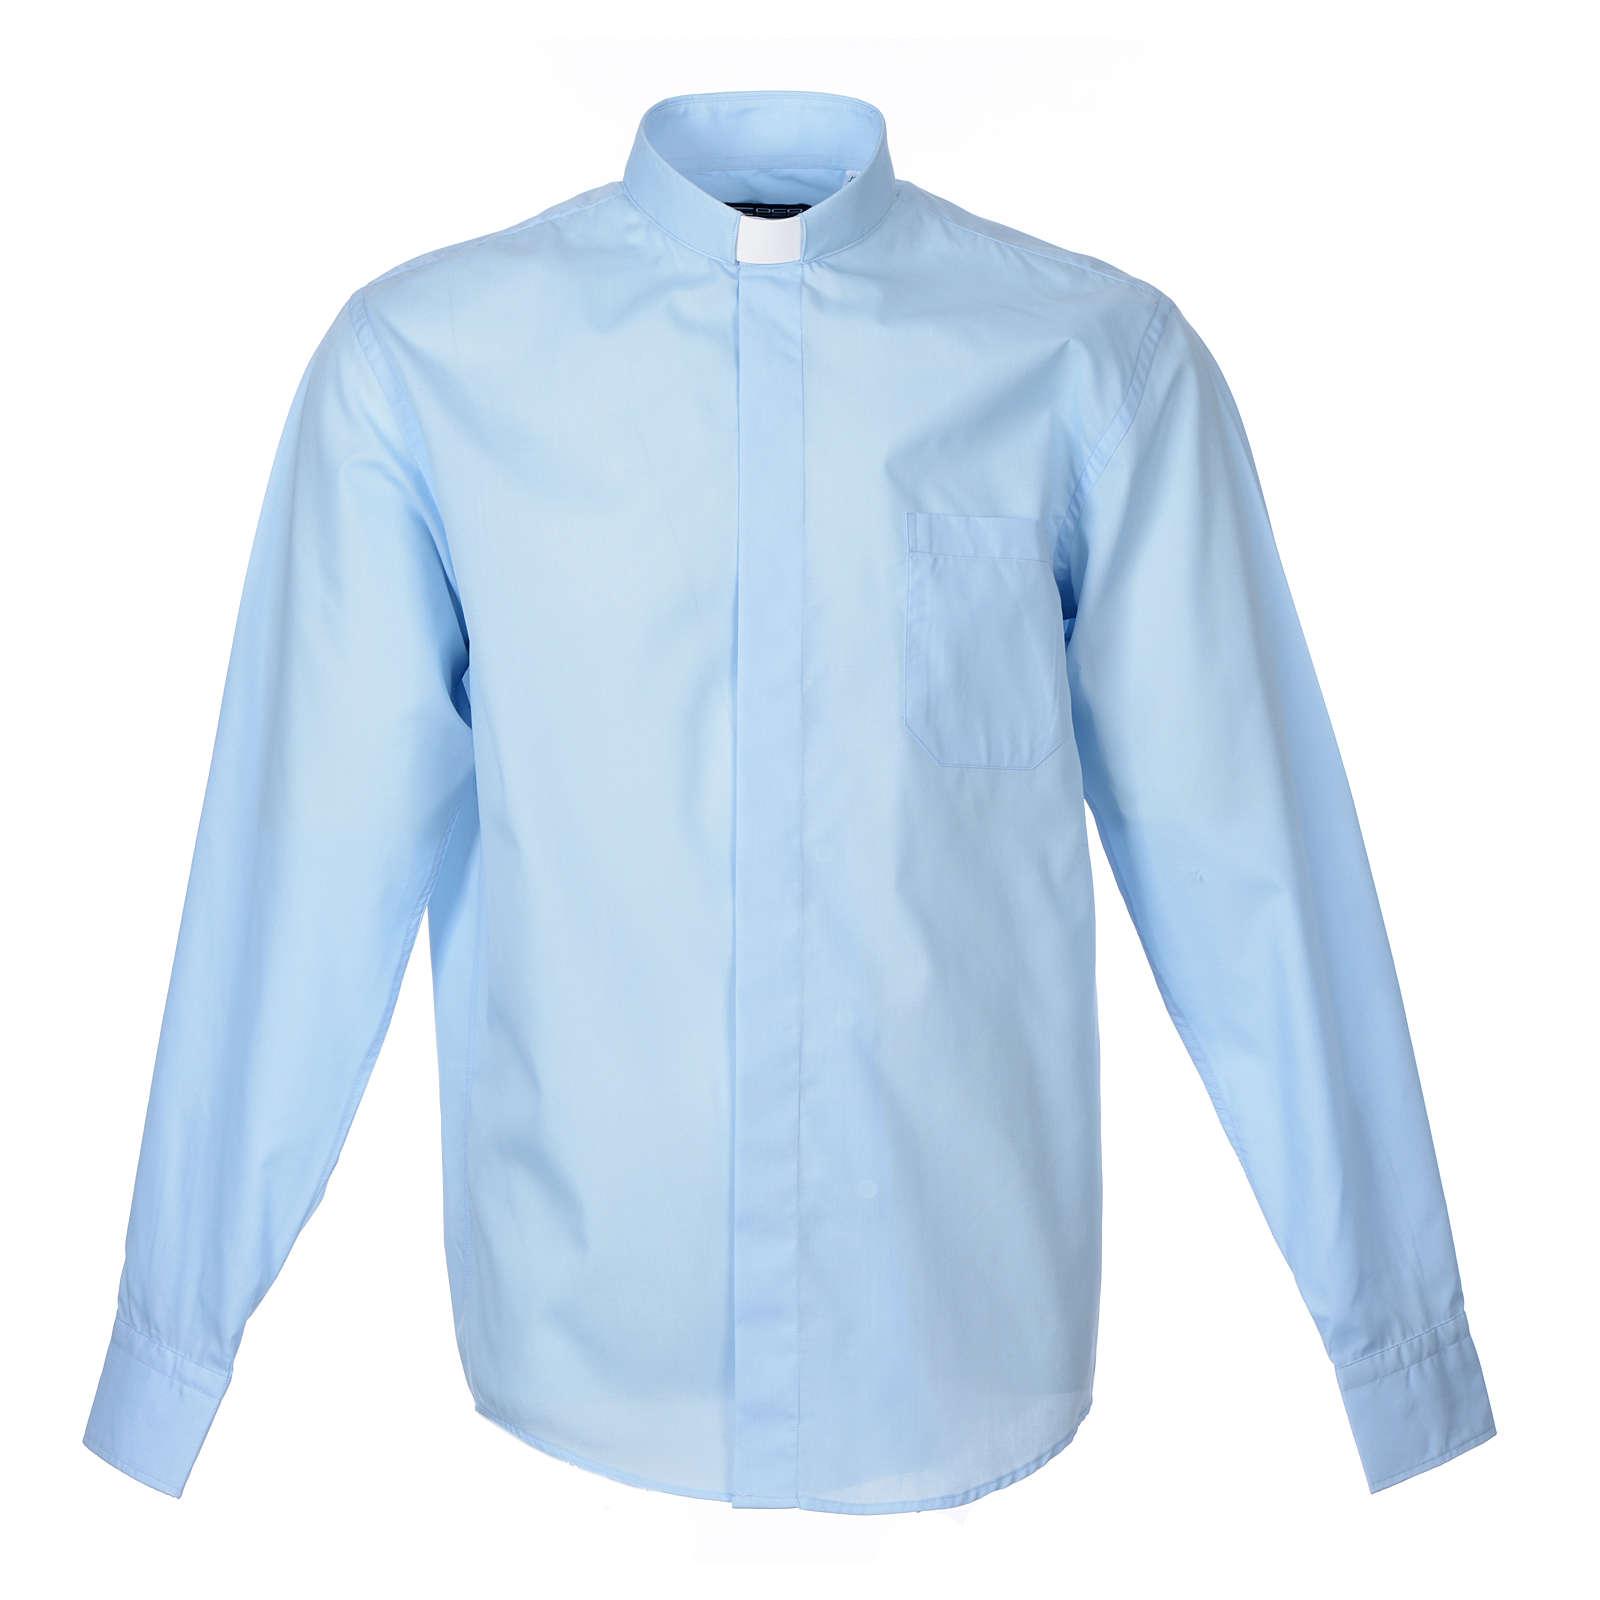 Camicia clergy M. Lunga tinta unita Misto cotone Celeste 4